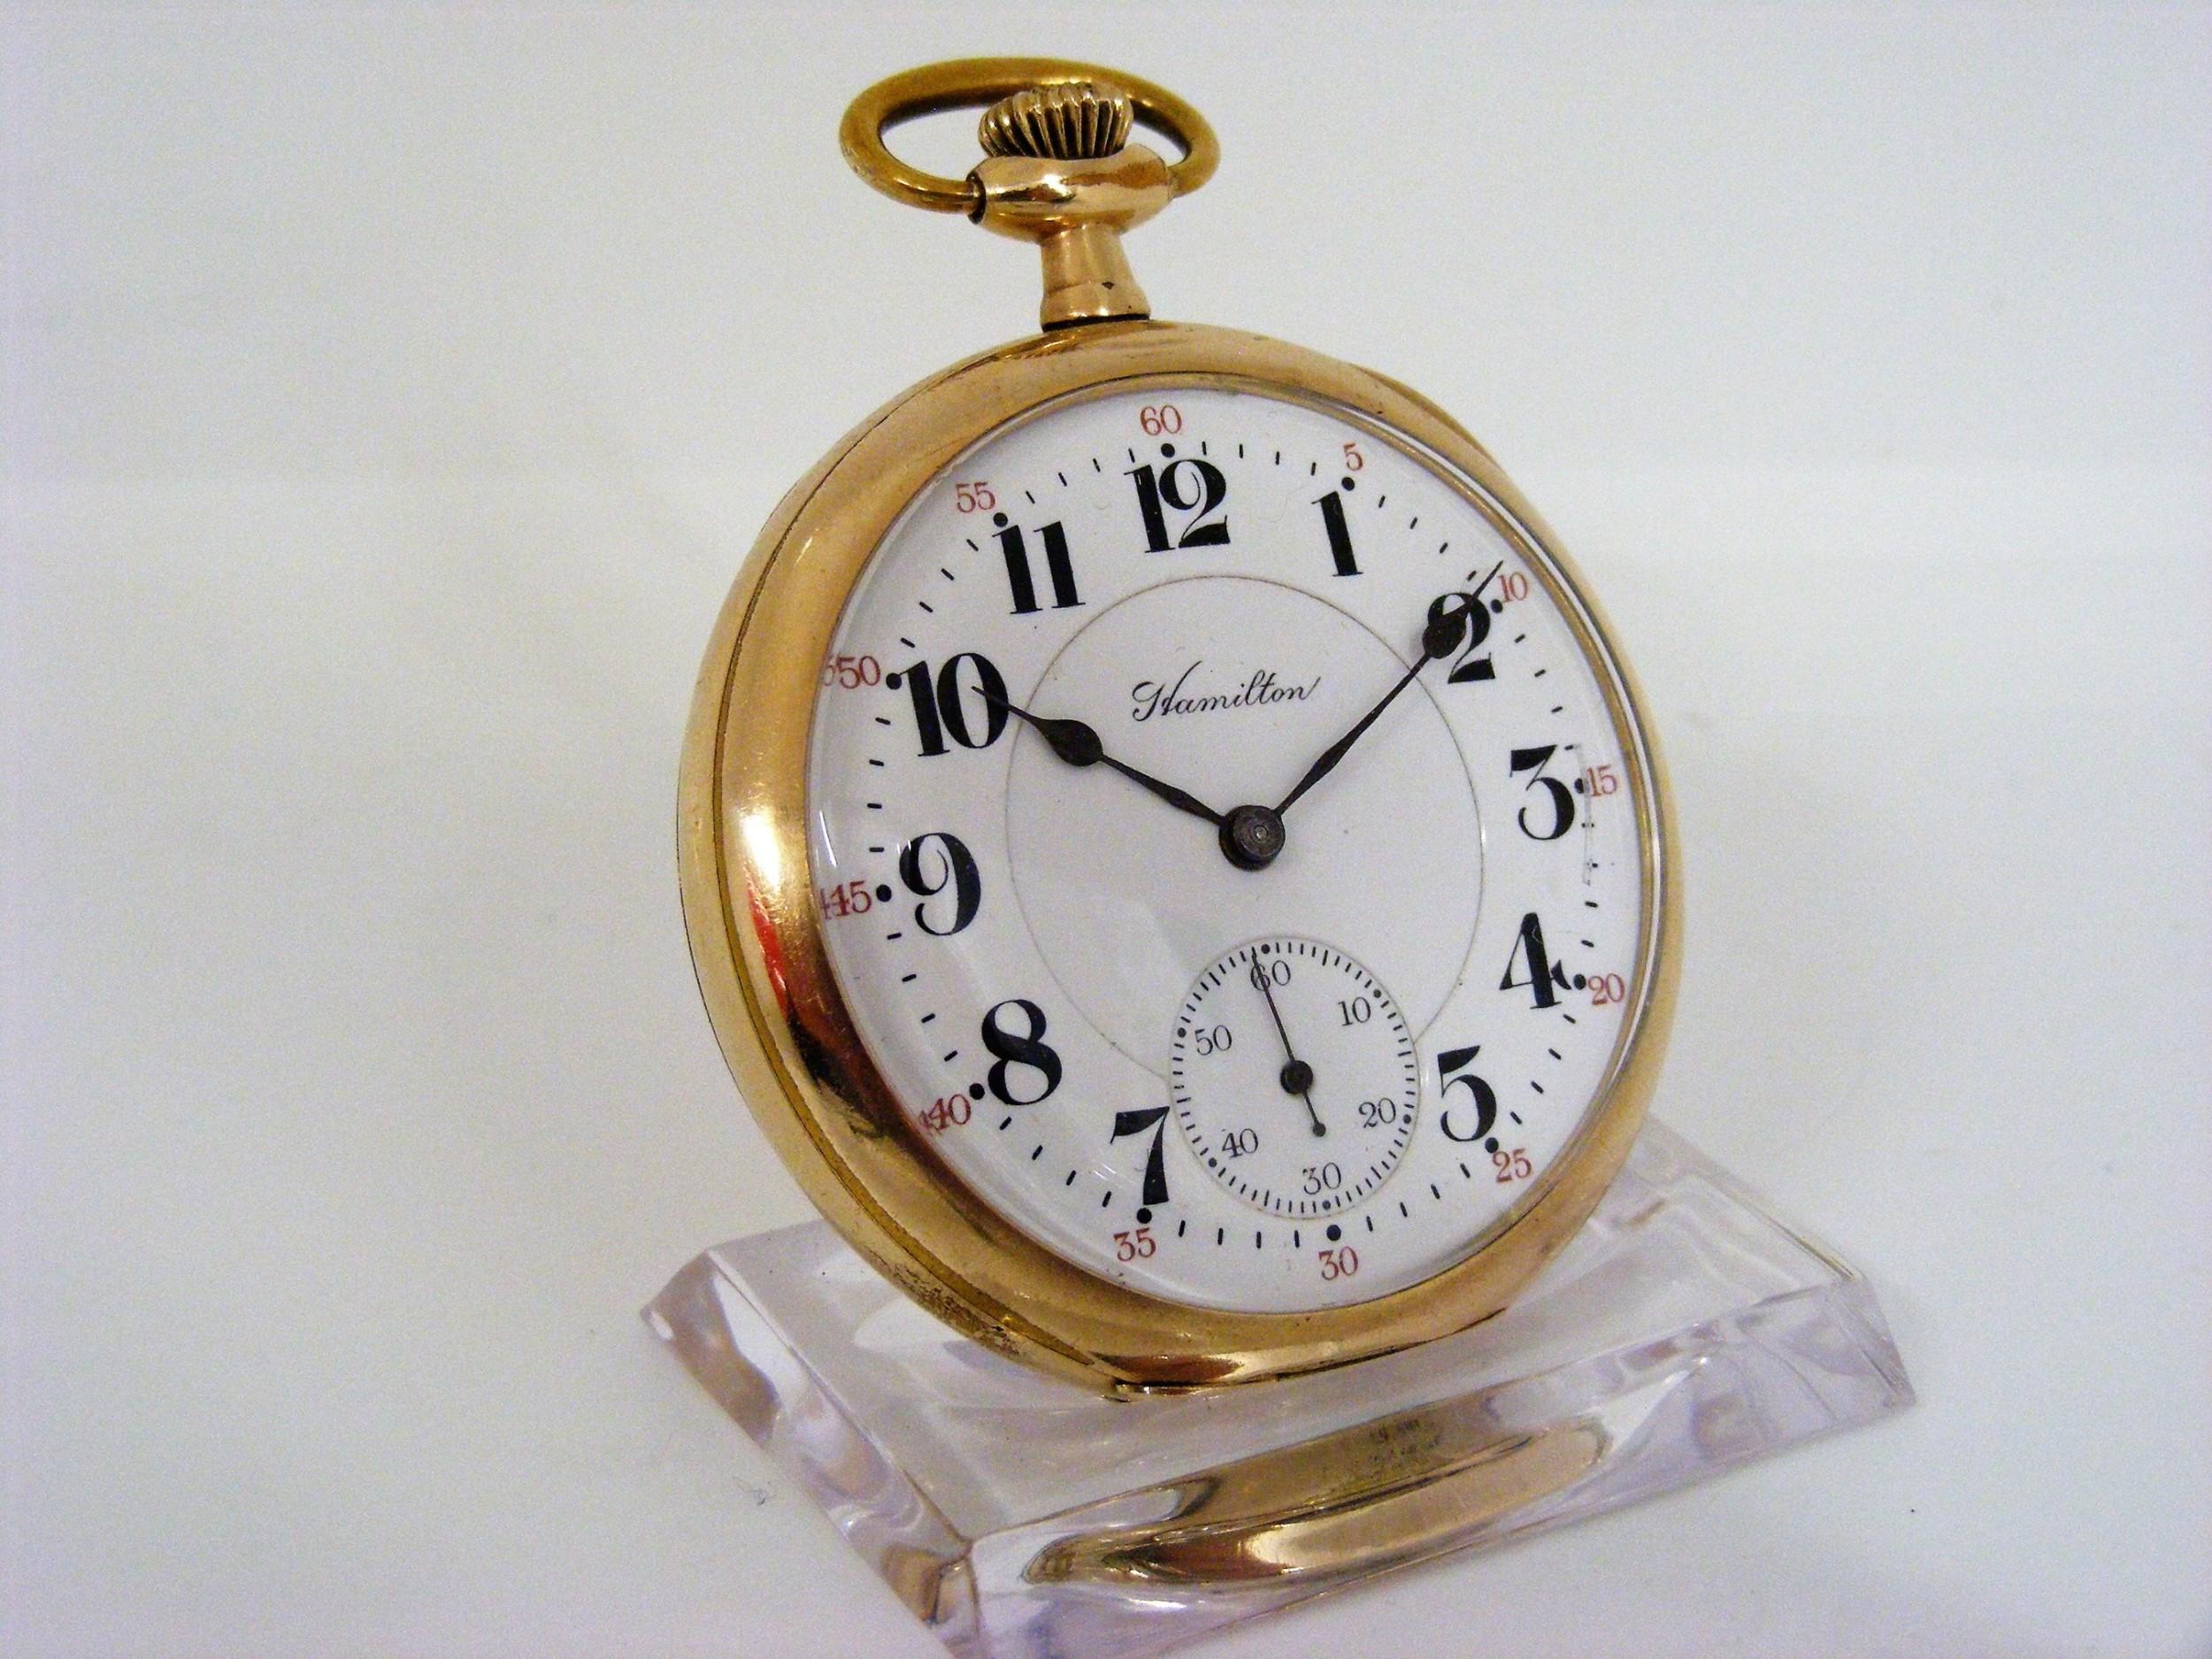 hamilton grade 992 21 jewel pocket watch